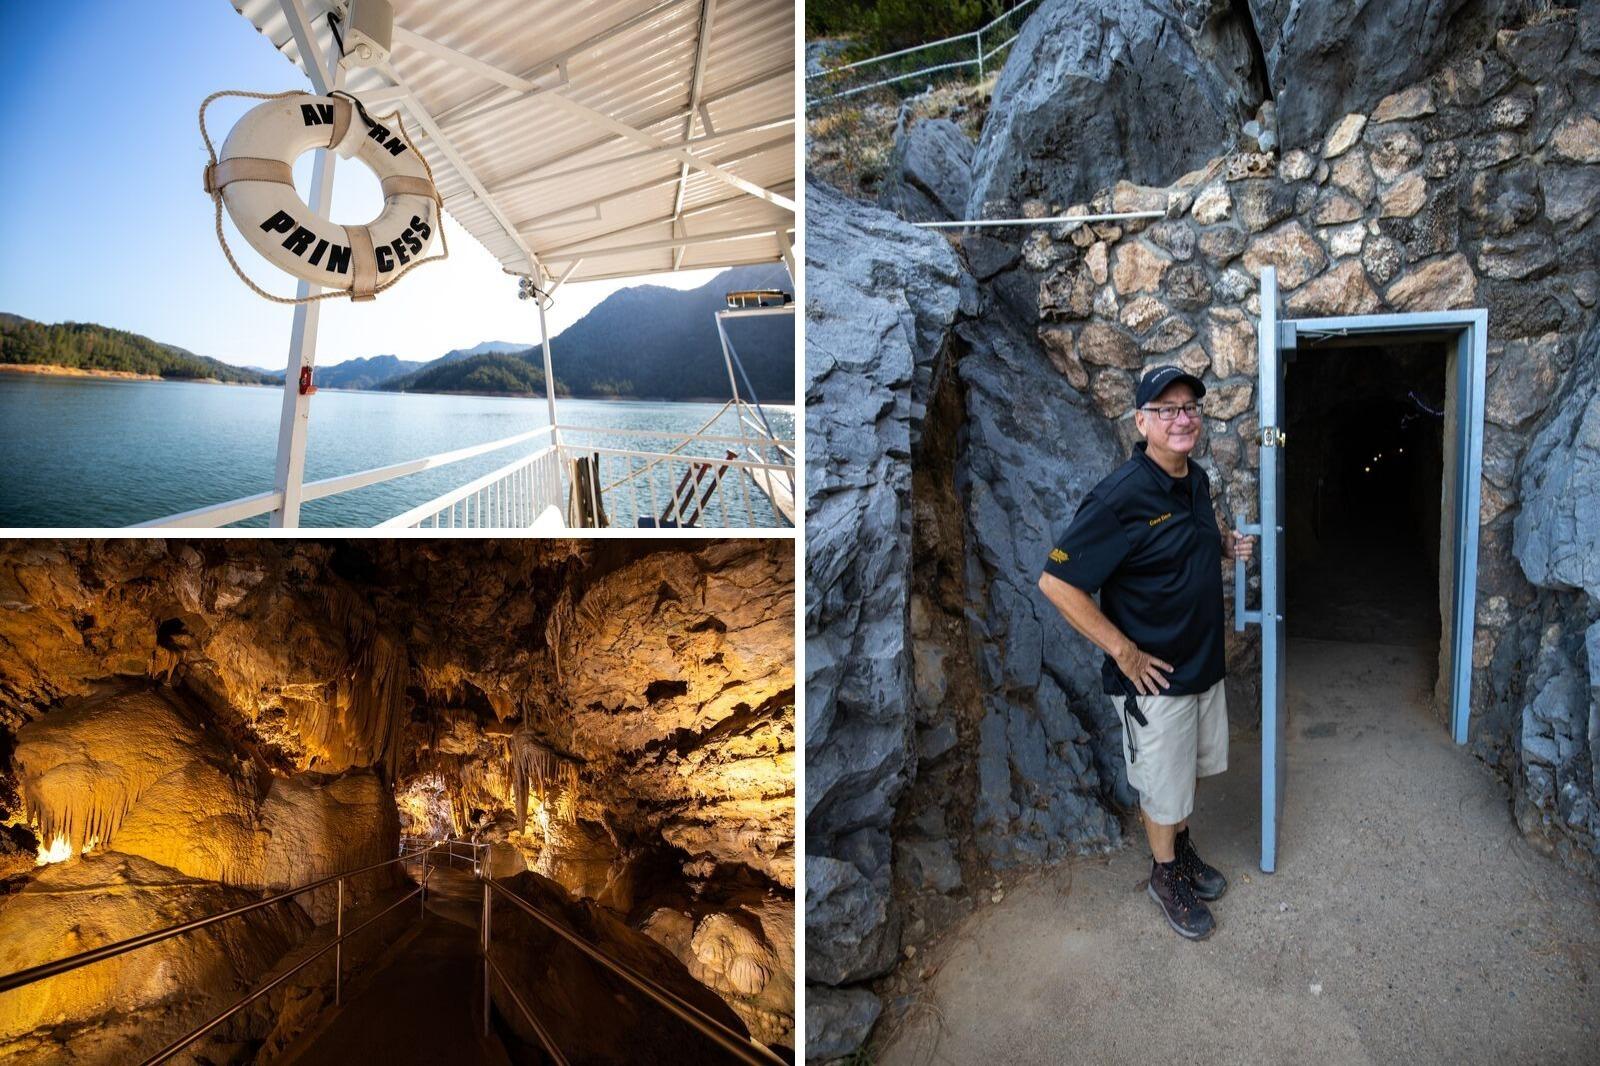 Adventure at Shasta Caverns Lake Shasta on your Road Trip